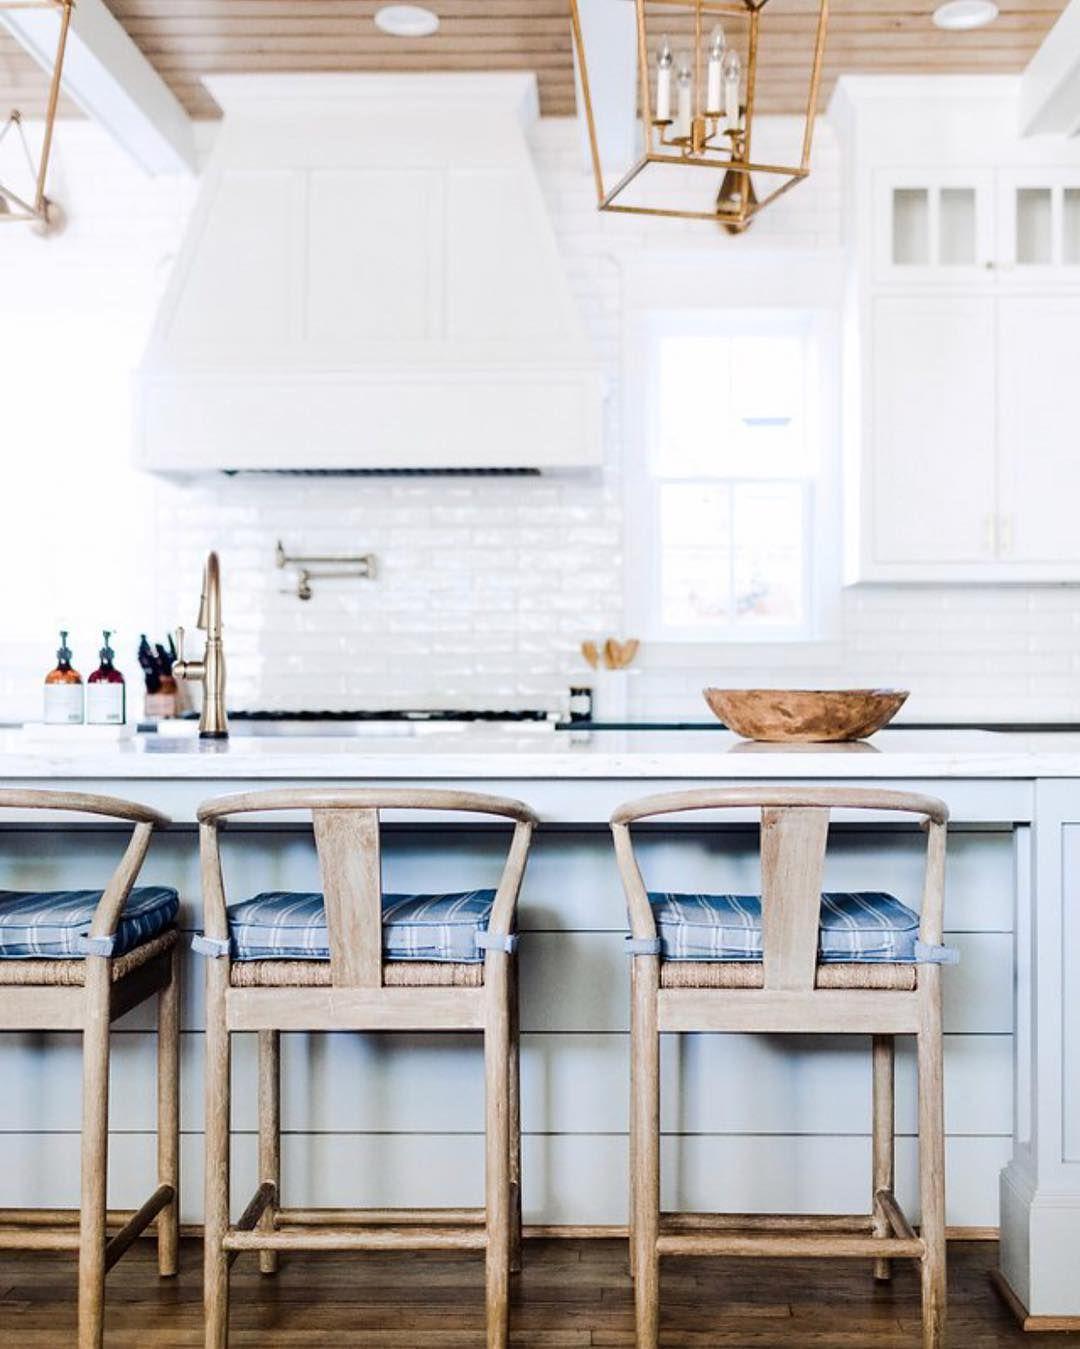 Pin von Tamera Thompson auf bar stools + counter stools | Pinterest ...